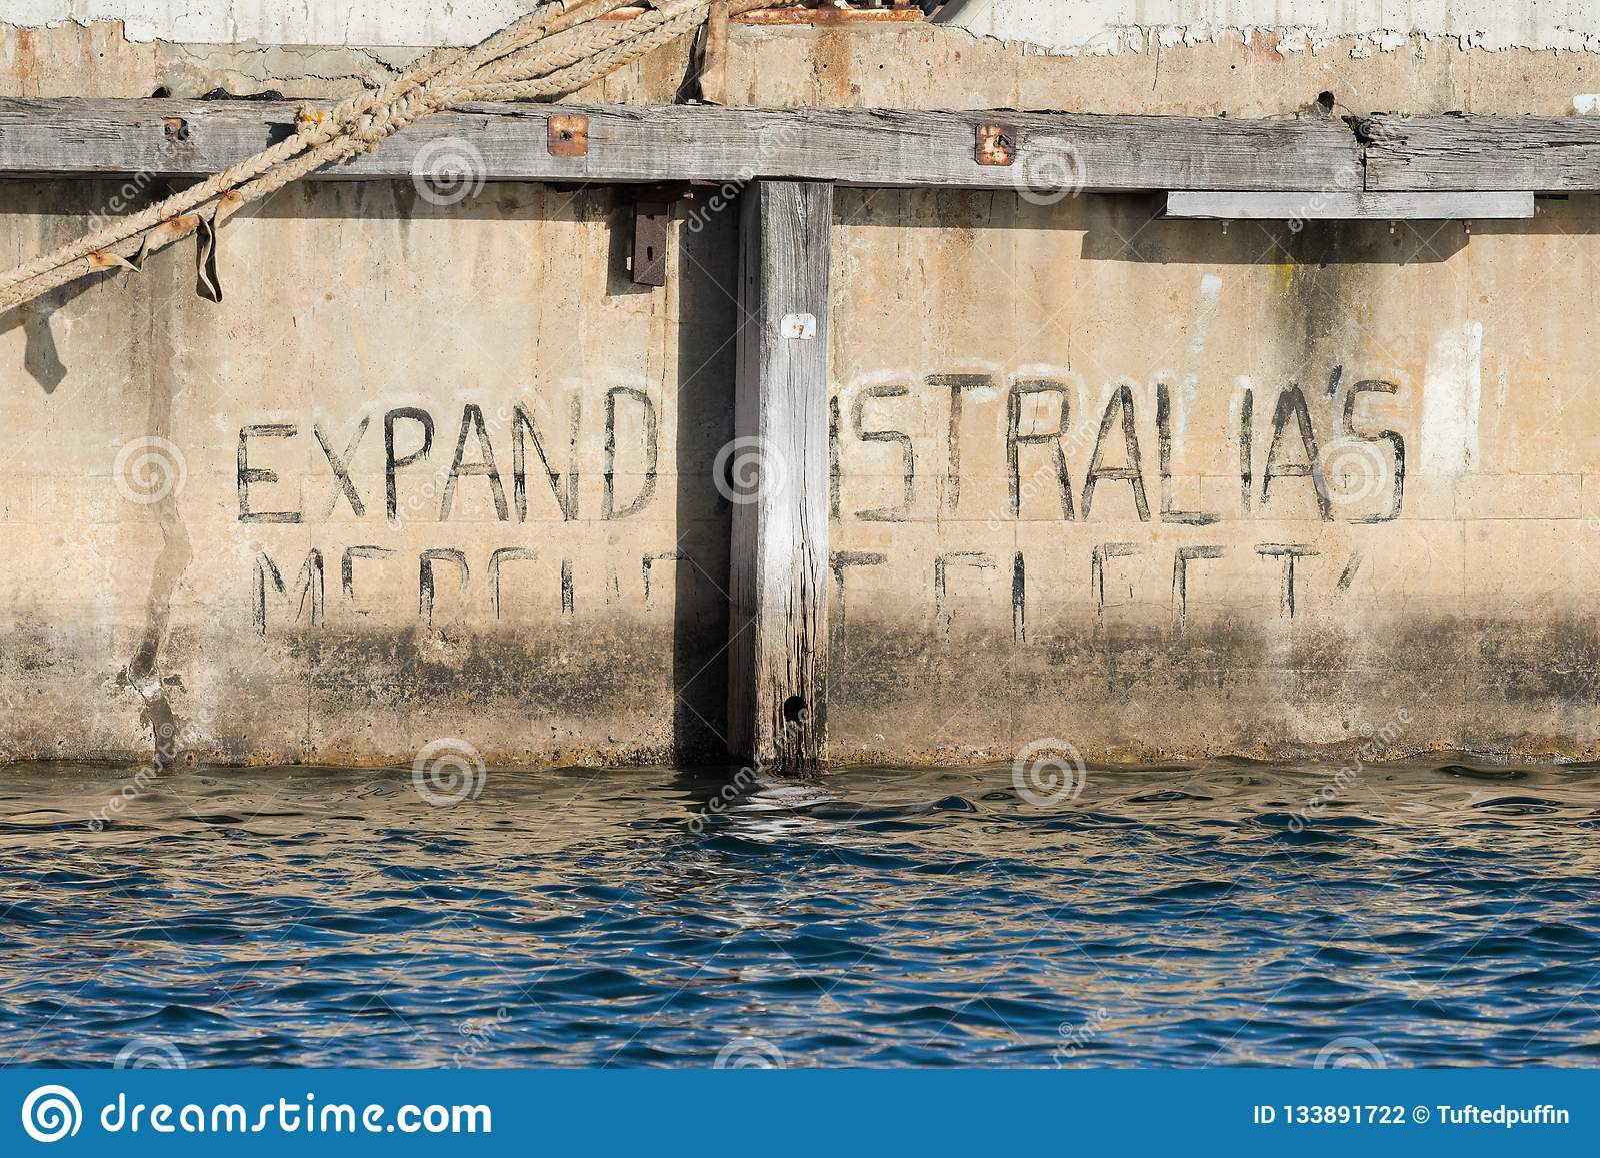 `Expand Australia`s Merchant Fleet` graffiti in South Australia